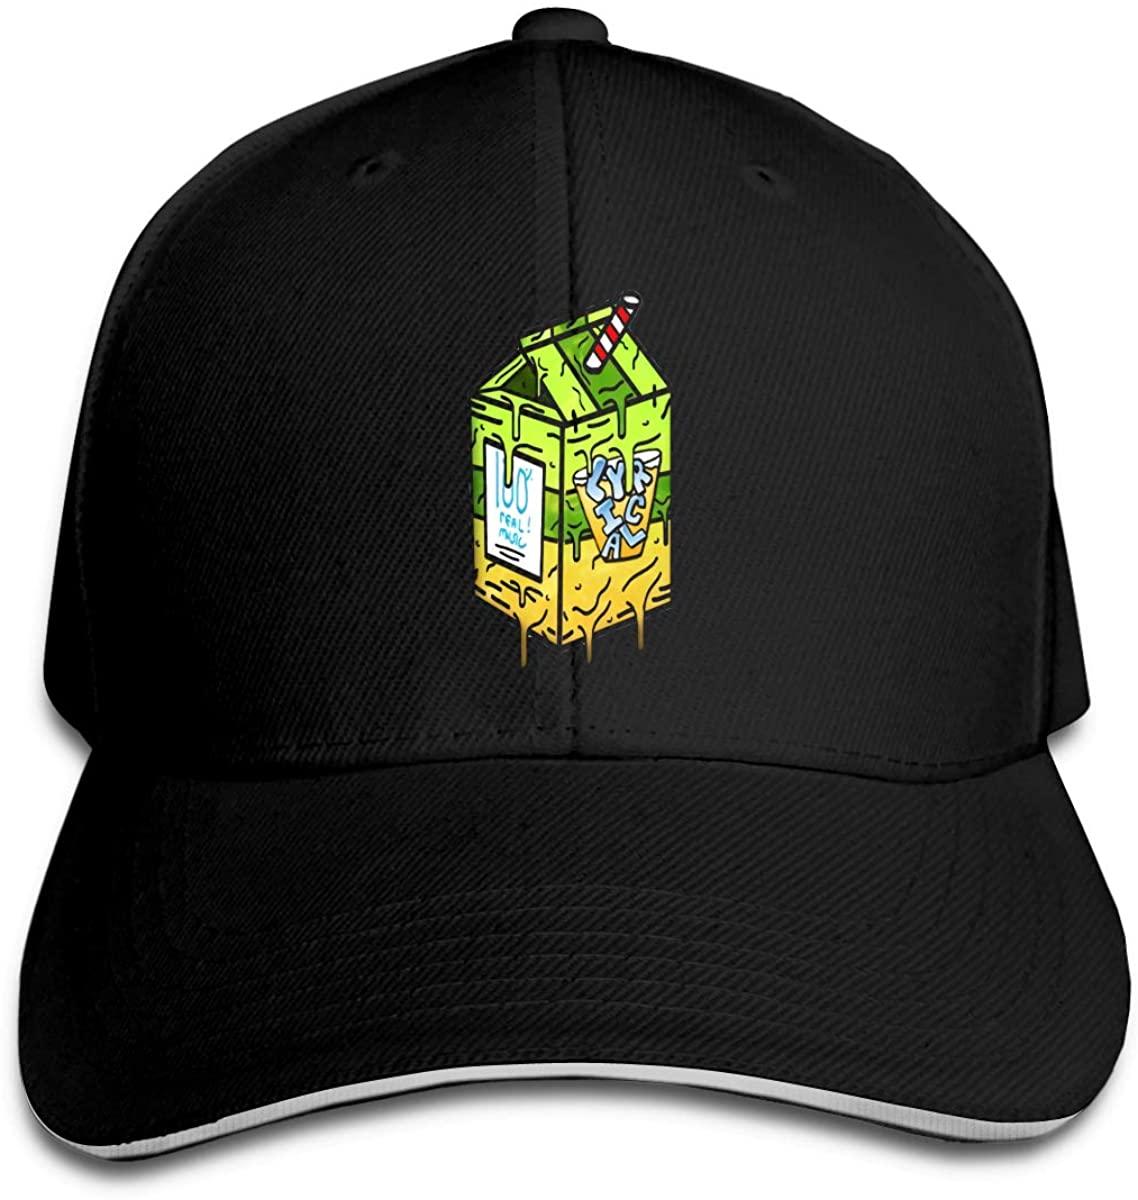 Lyrical Lemonade Hip Hop Baseball Cap Golf Trucker Baseball Cap Adjustable Peaked Sandwich Hat Black Unisex Casquette